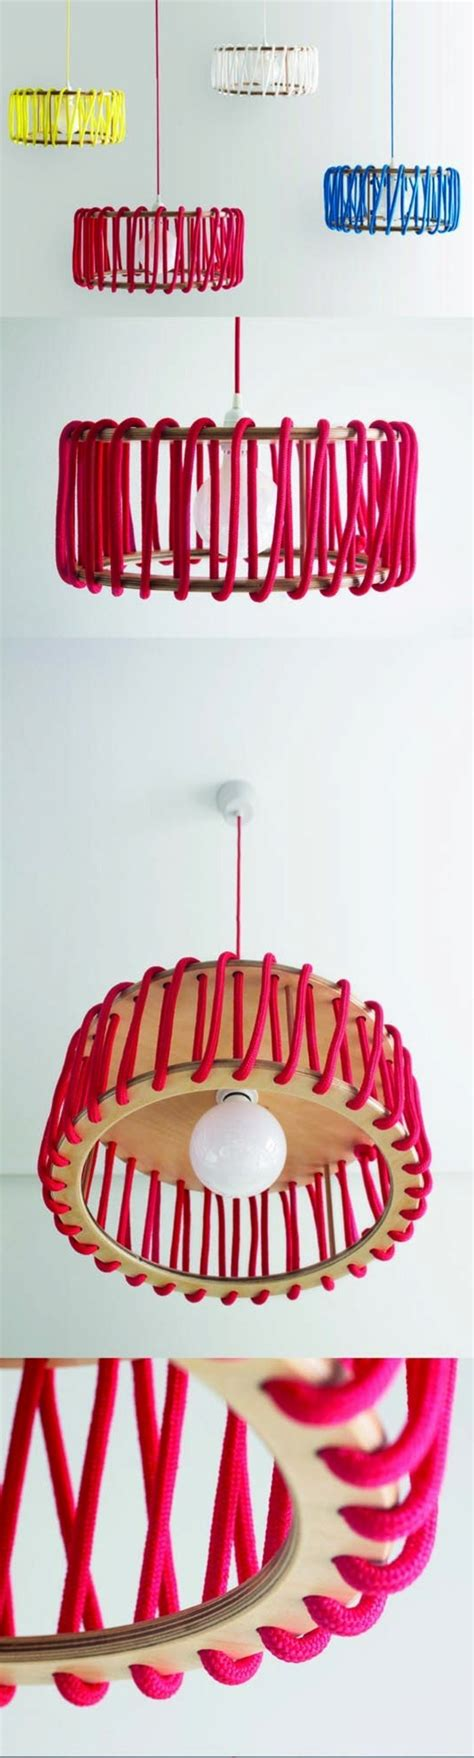 Bastelideen Für Kinderzimmer 2687 by Wandfarbe Kinderzimmer Feng Shui